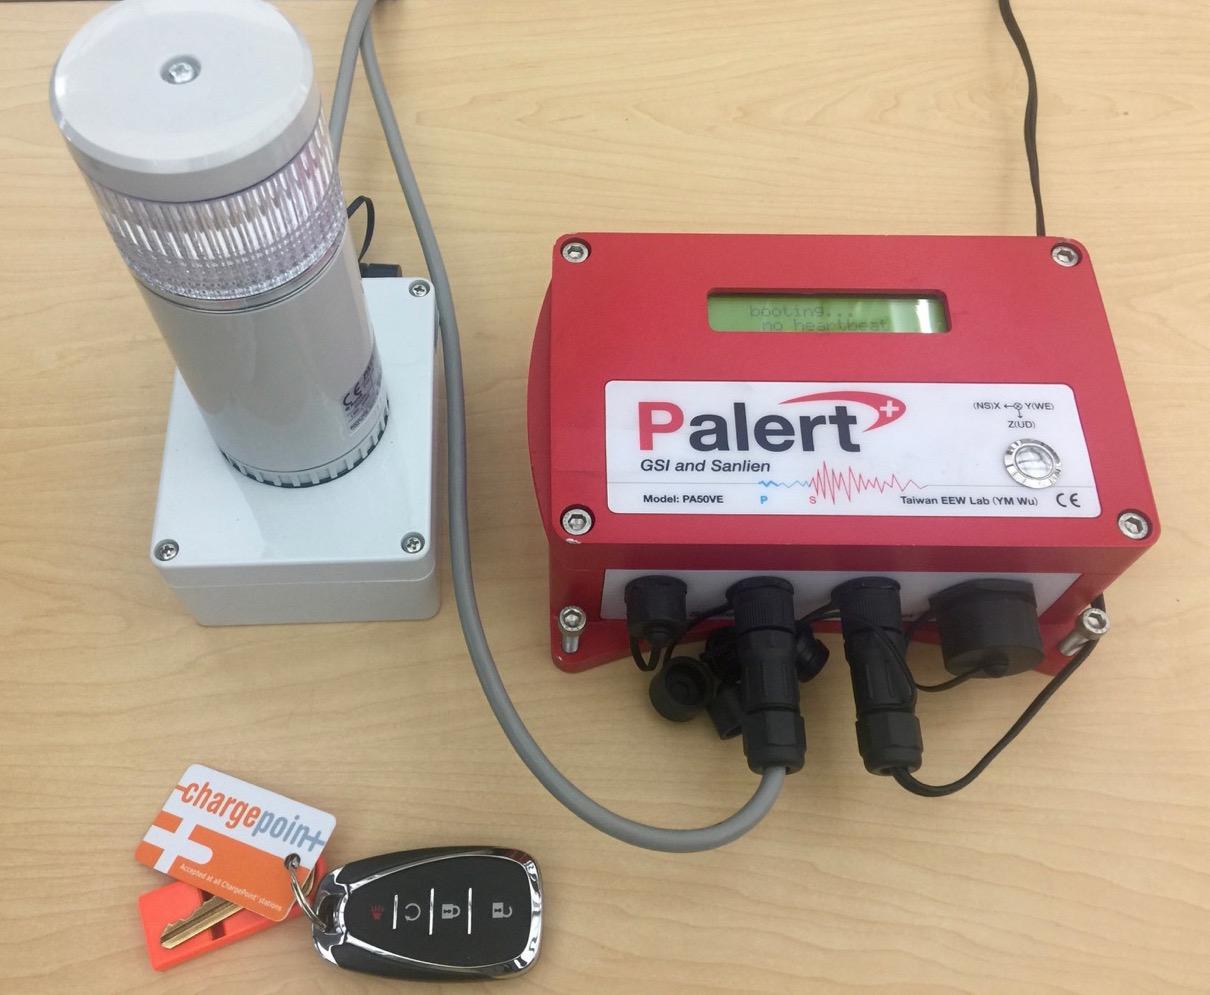 Palert instrument and strobe light